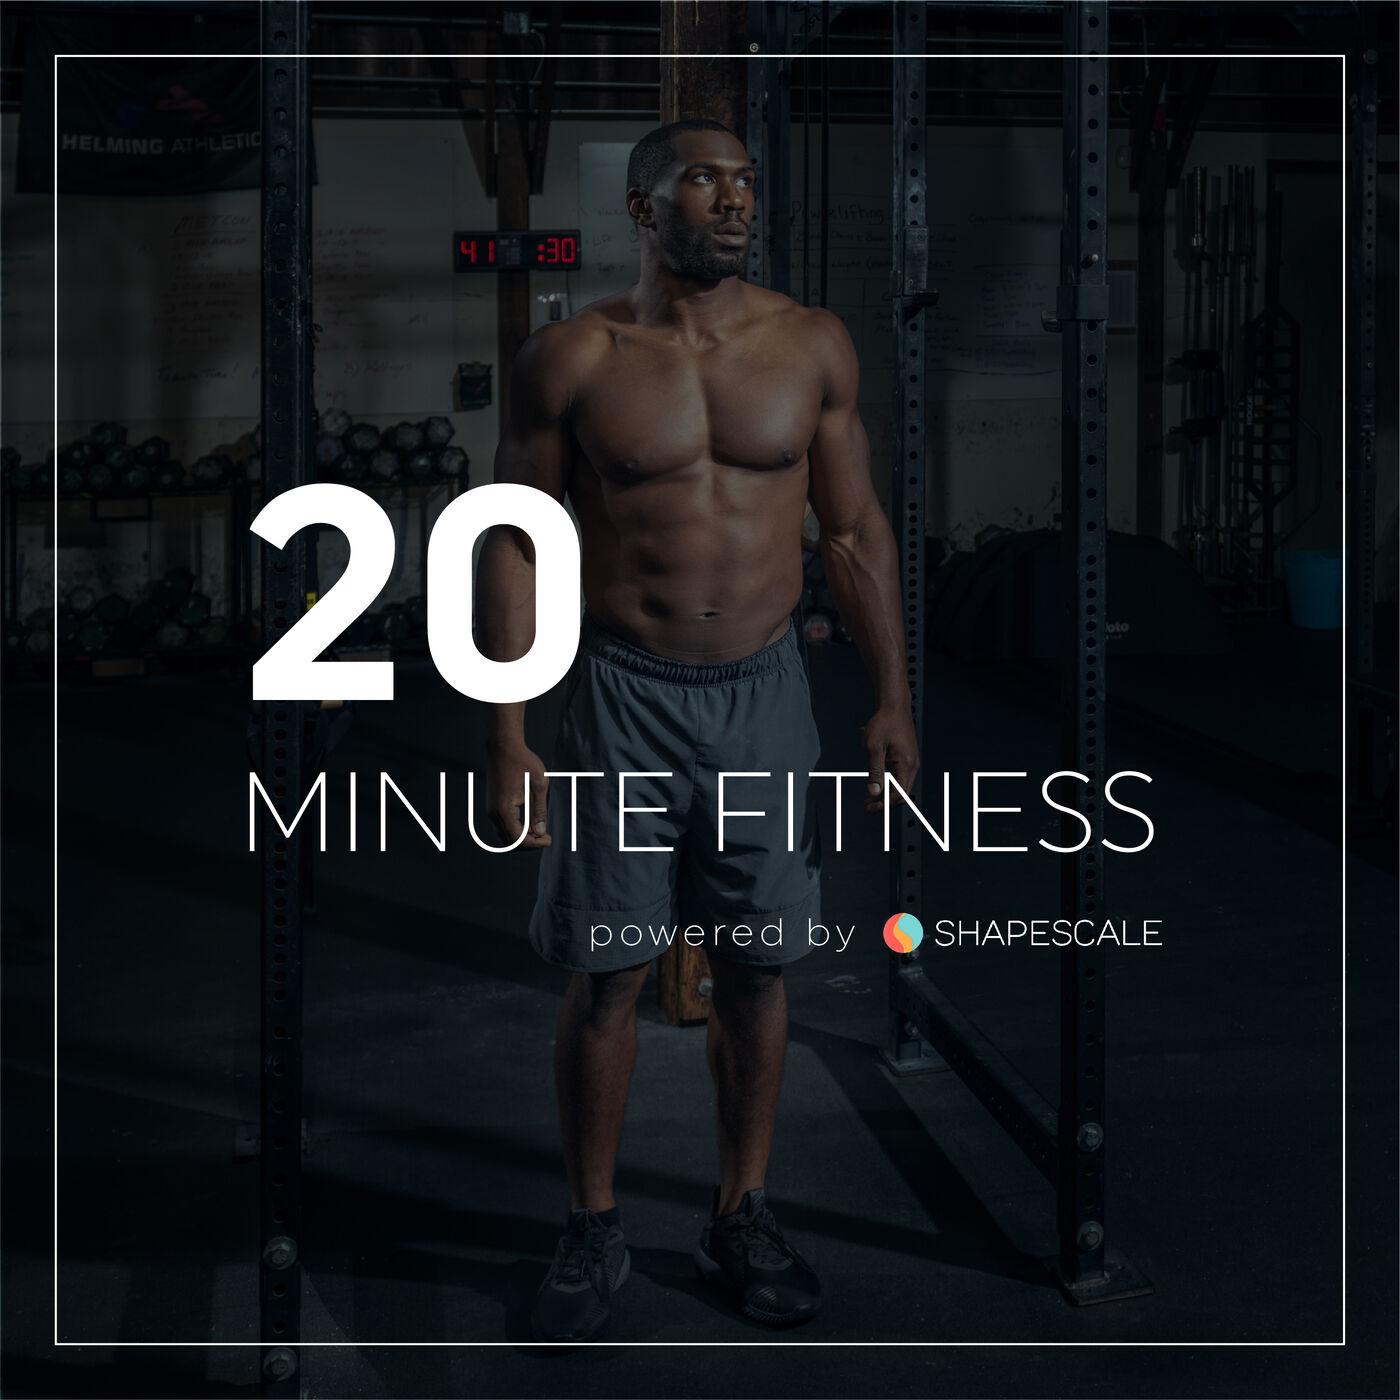 Tips On Training, Nutrition & Discipline With An Ultramarathon Runner - 20 Minutes Fitness Episode #228